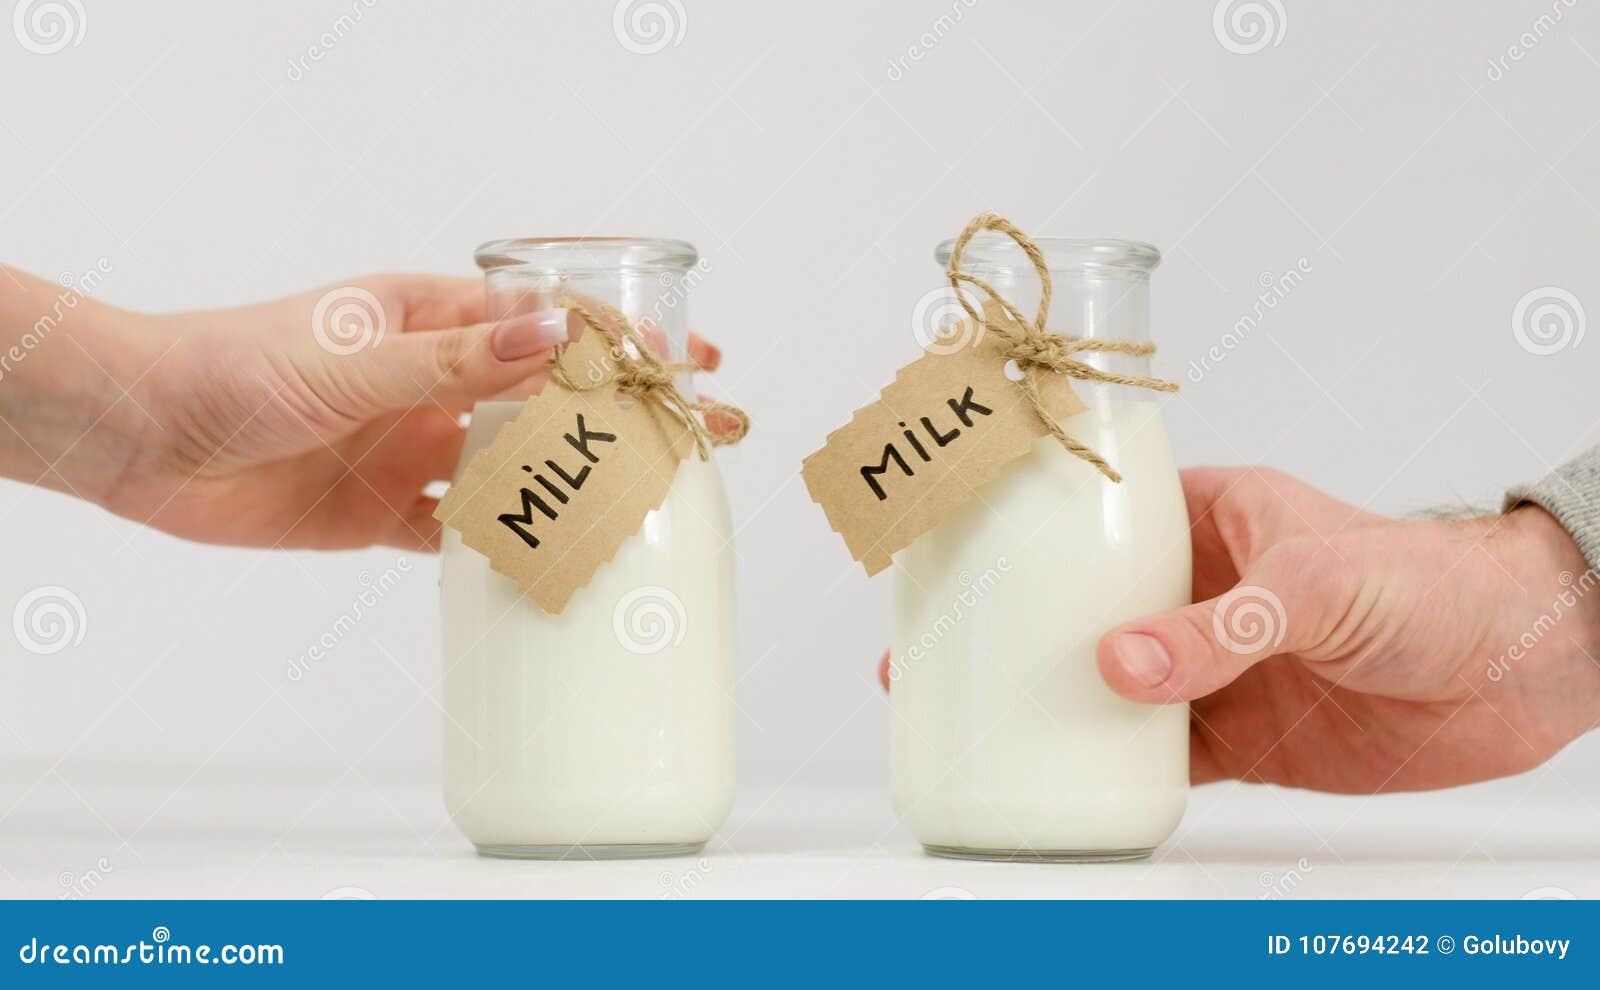 Bottle milk healthy habit organic dairy nutrition